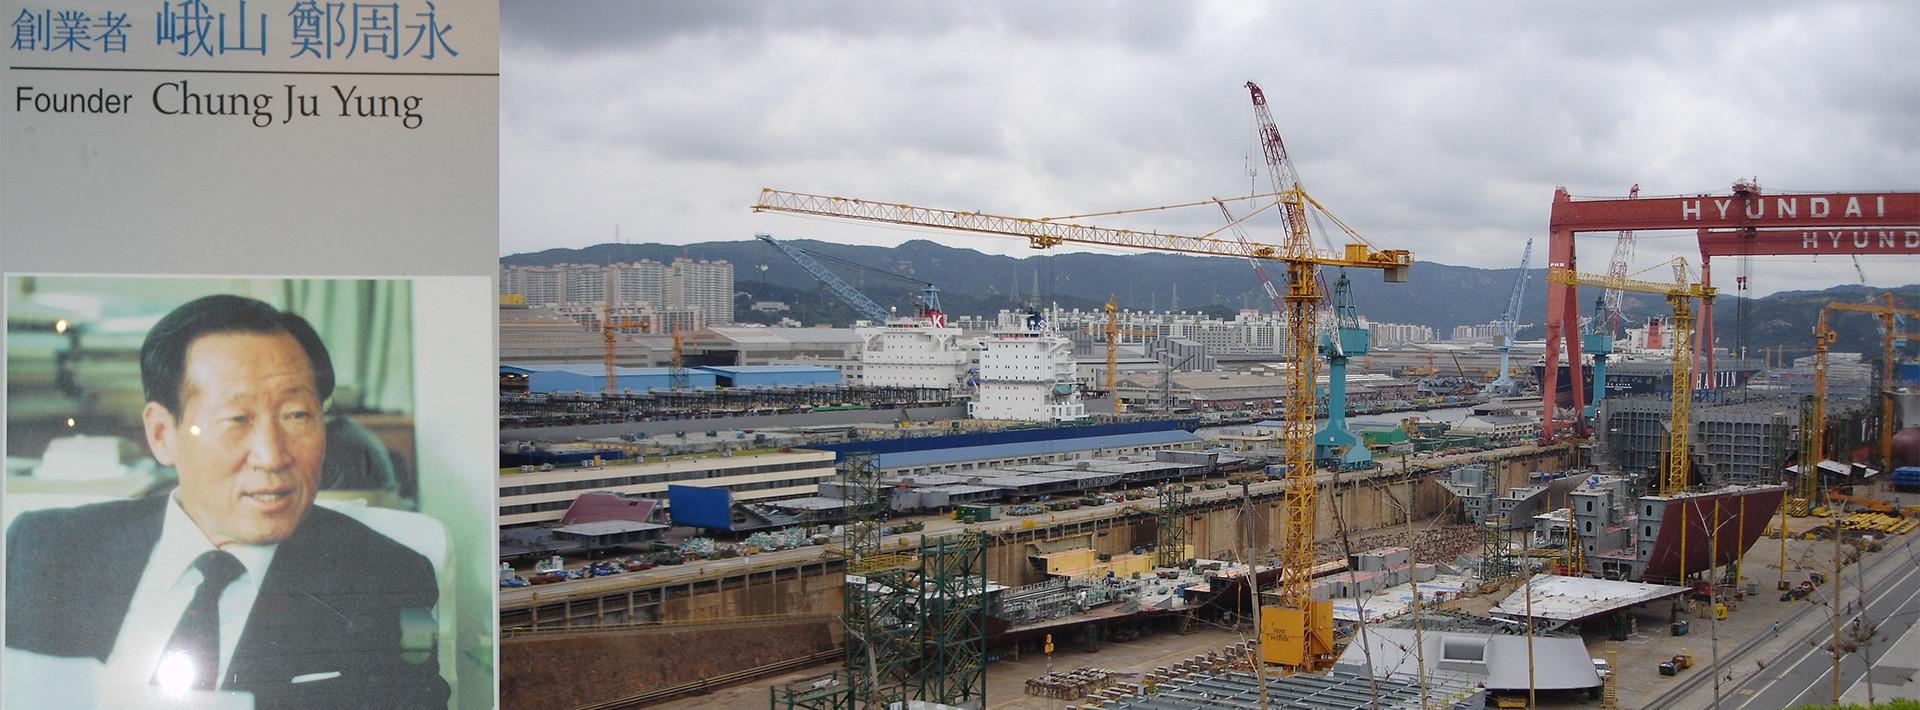 Korea: Στο «Ναυπηγικό Σύμπαν» της Άπω Ανατολής, κορεα, ναυπηγεία, ναυπηγια, χιουνται, Hyundai, Choi Kil Seon, Hyundai Heavy Industries, Ju-yung Chung